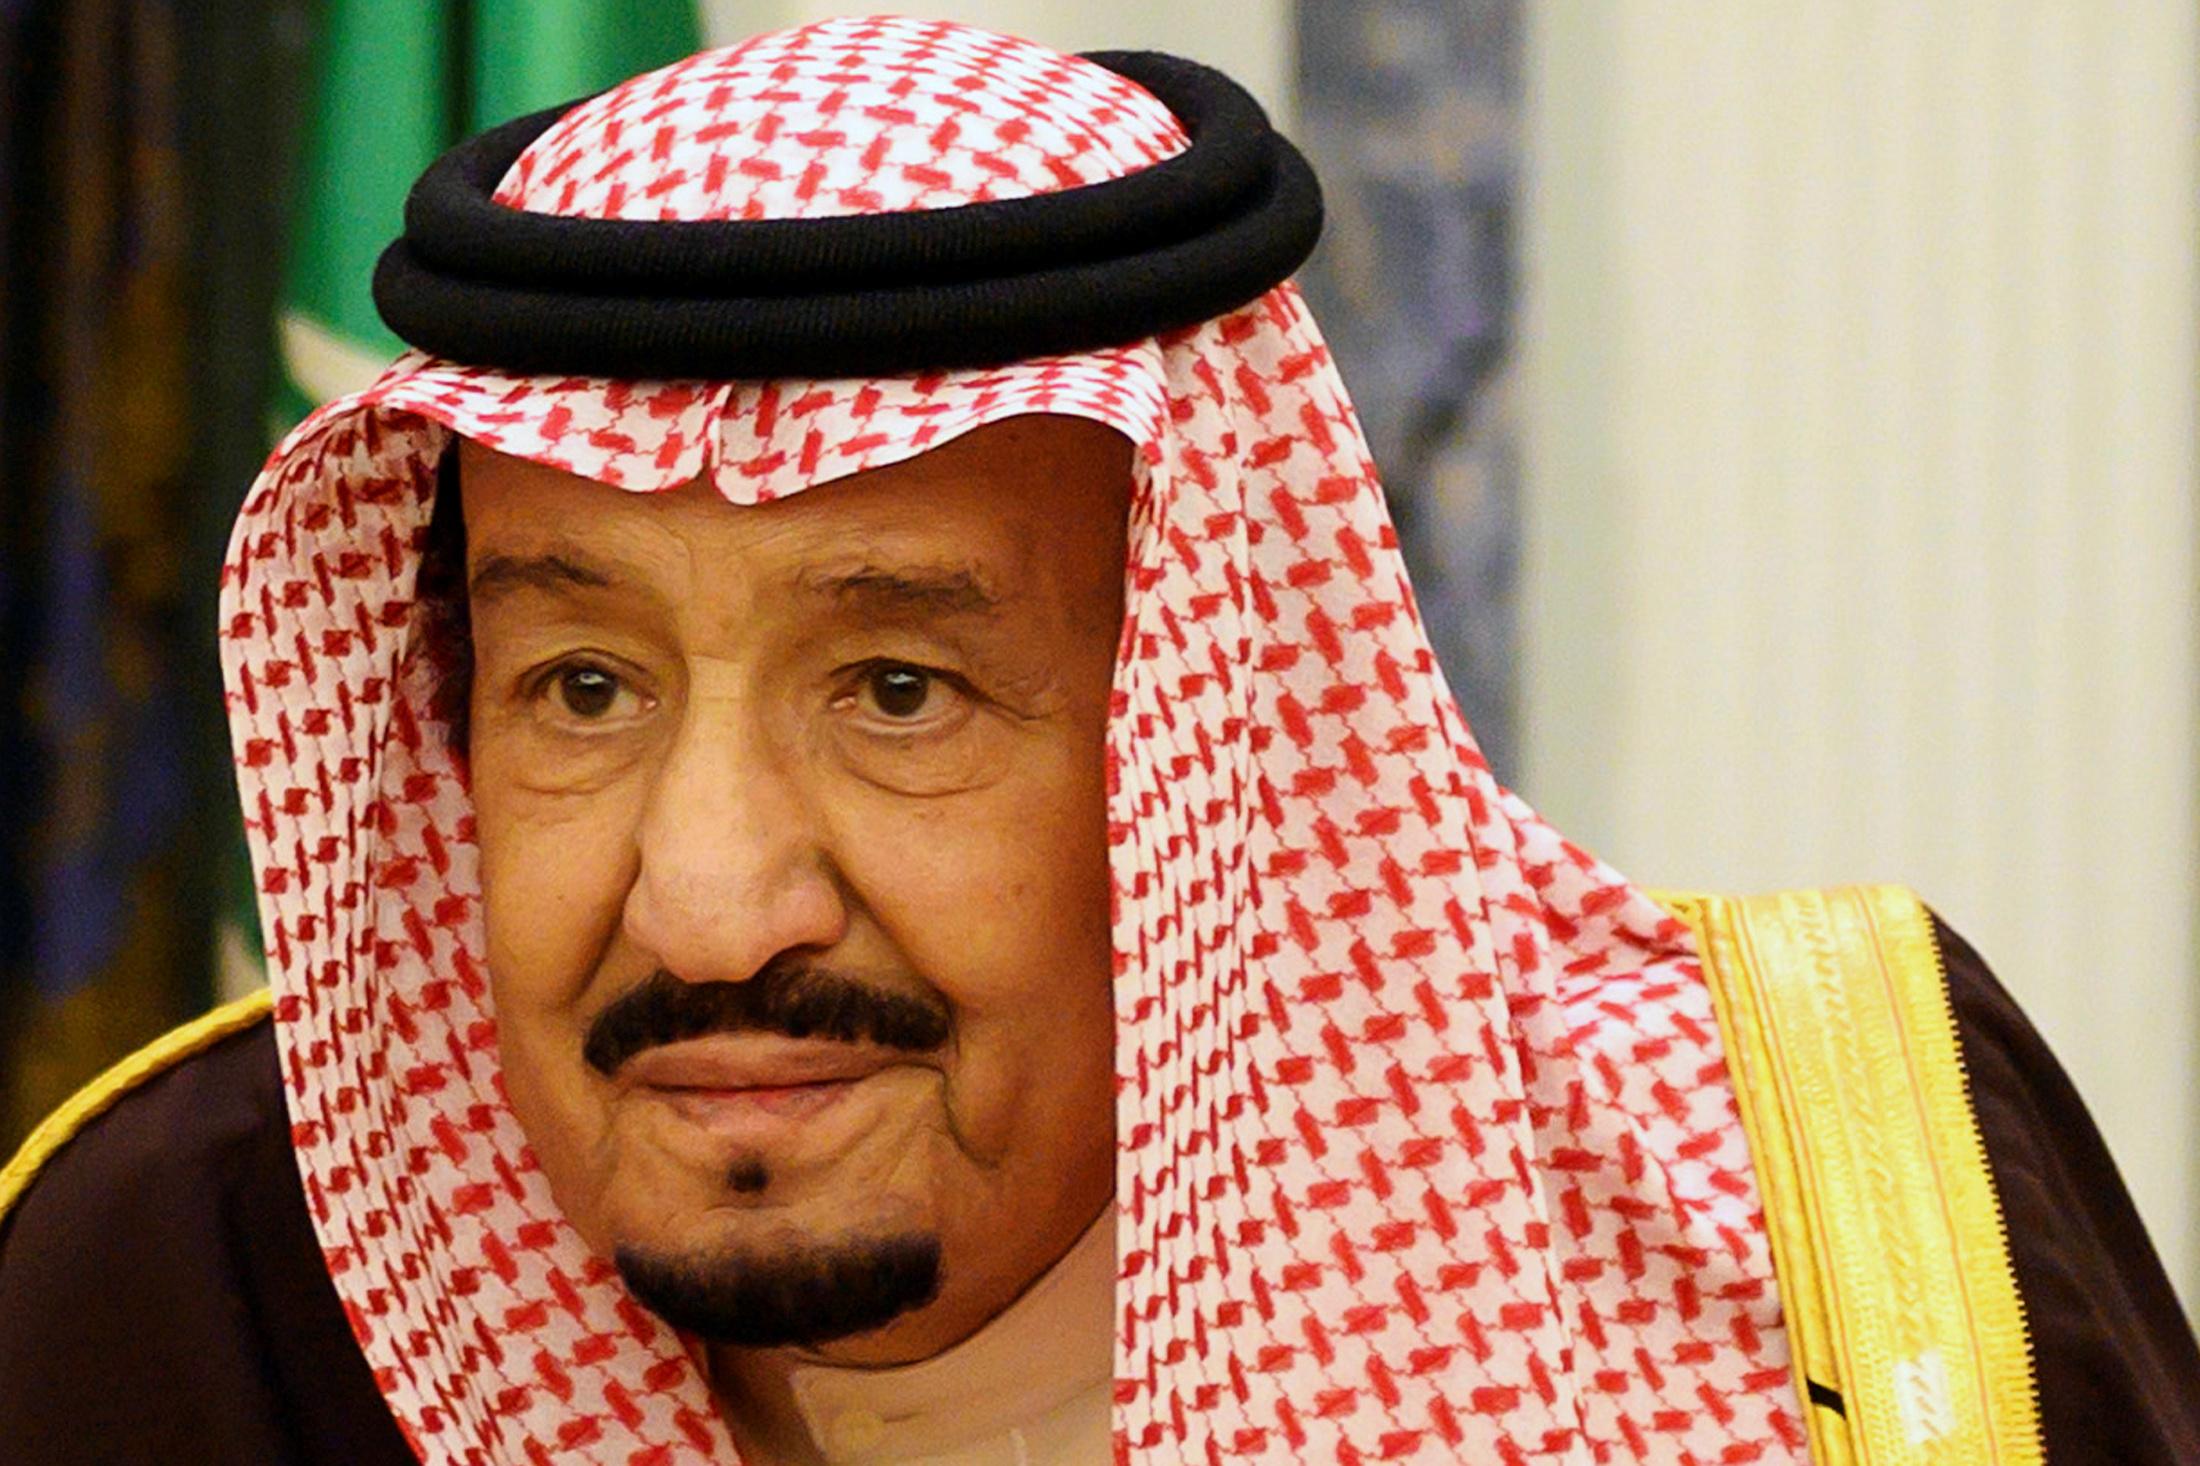 Saudi Arabia's King Salman bin Abdulaziz meets with U.S. Secretary of State Mike Pompeo (not pictured) in Riyadh, Saudi Arabia January 14, 2019. Andrew Caballero-Reynolds/Pool via REUTERS/File Photo